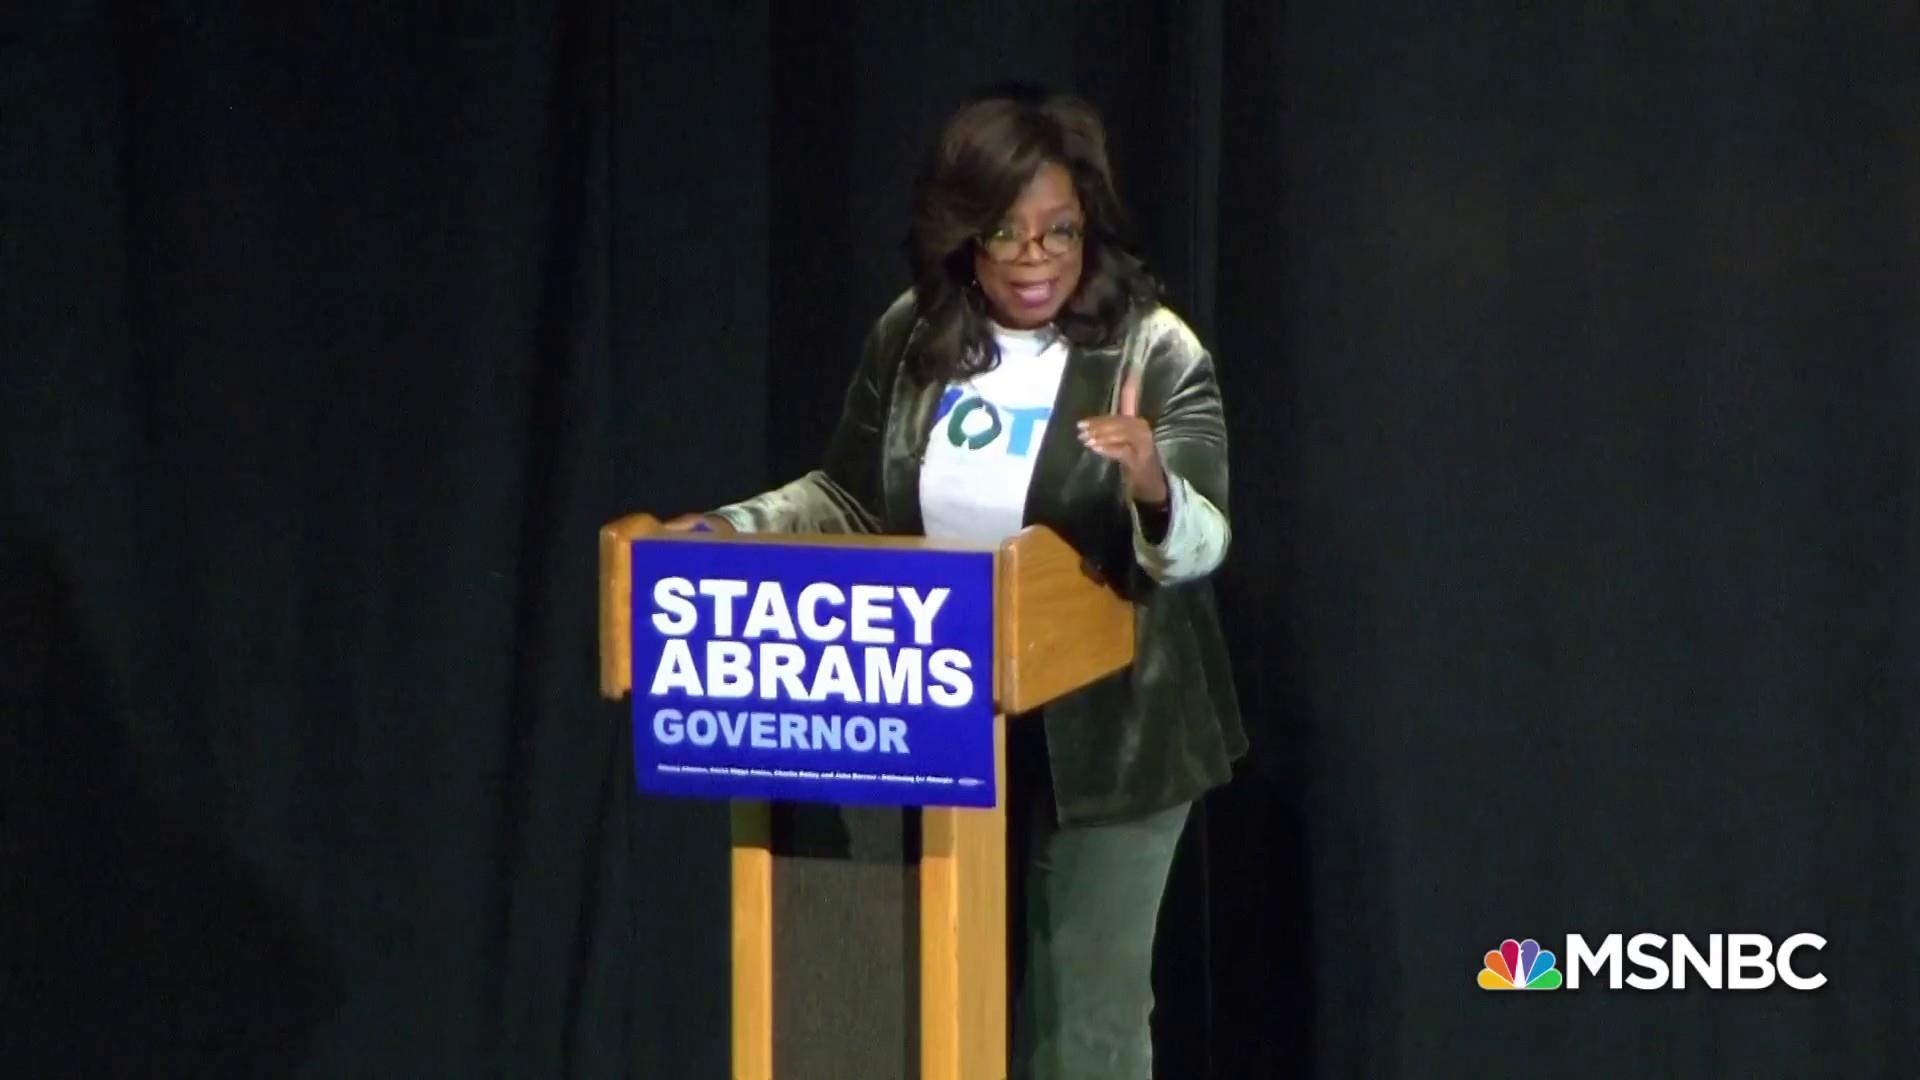 Fmr. DNC Chair: Oprah transcends politics, reaches the heart